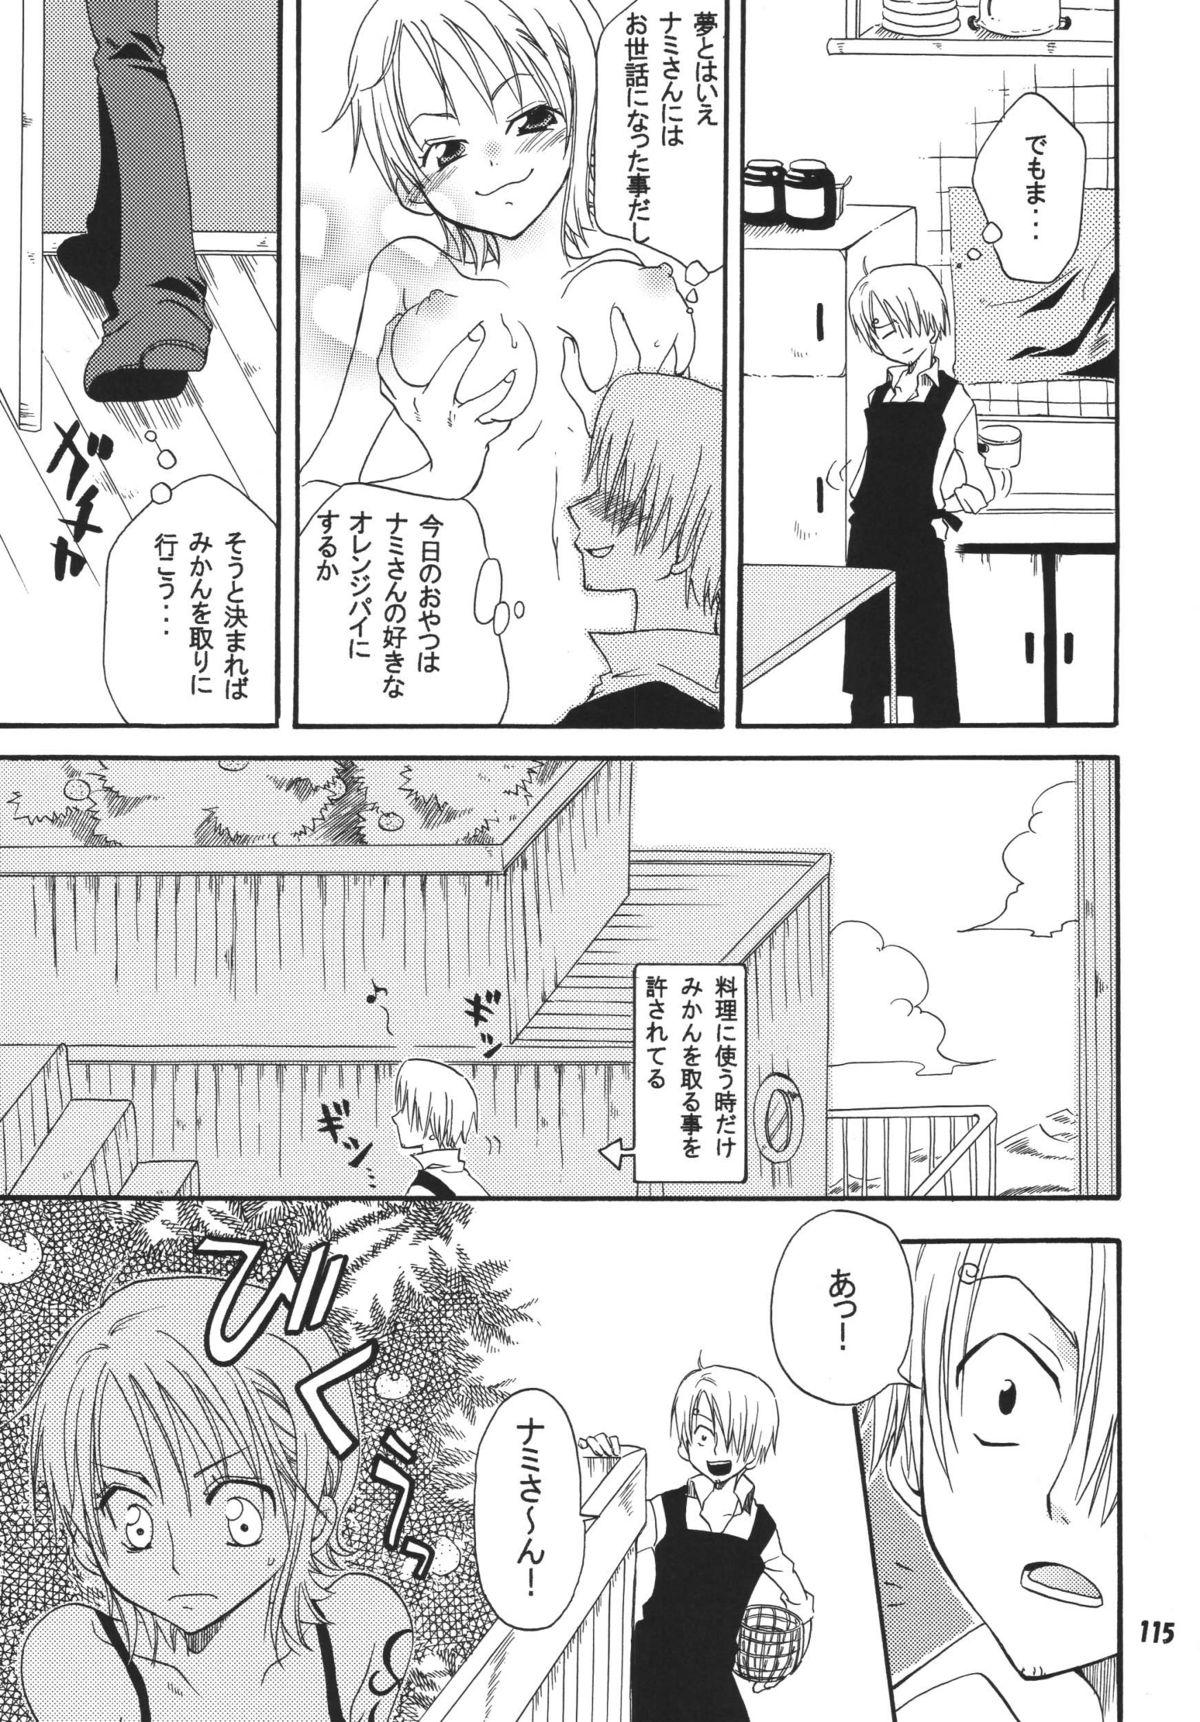 Kaizoku Musume. DX 113